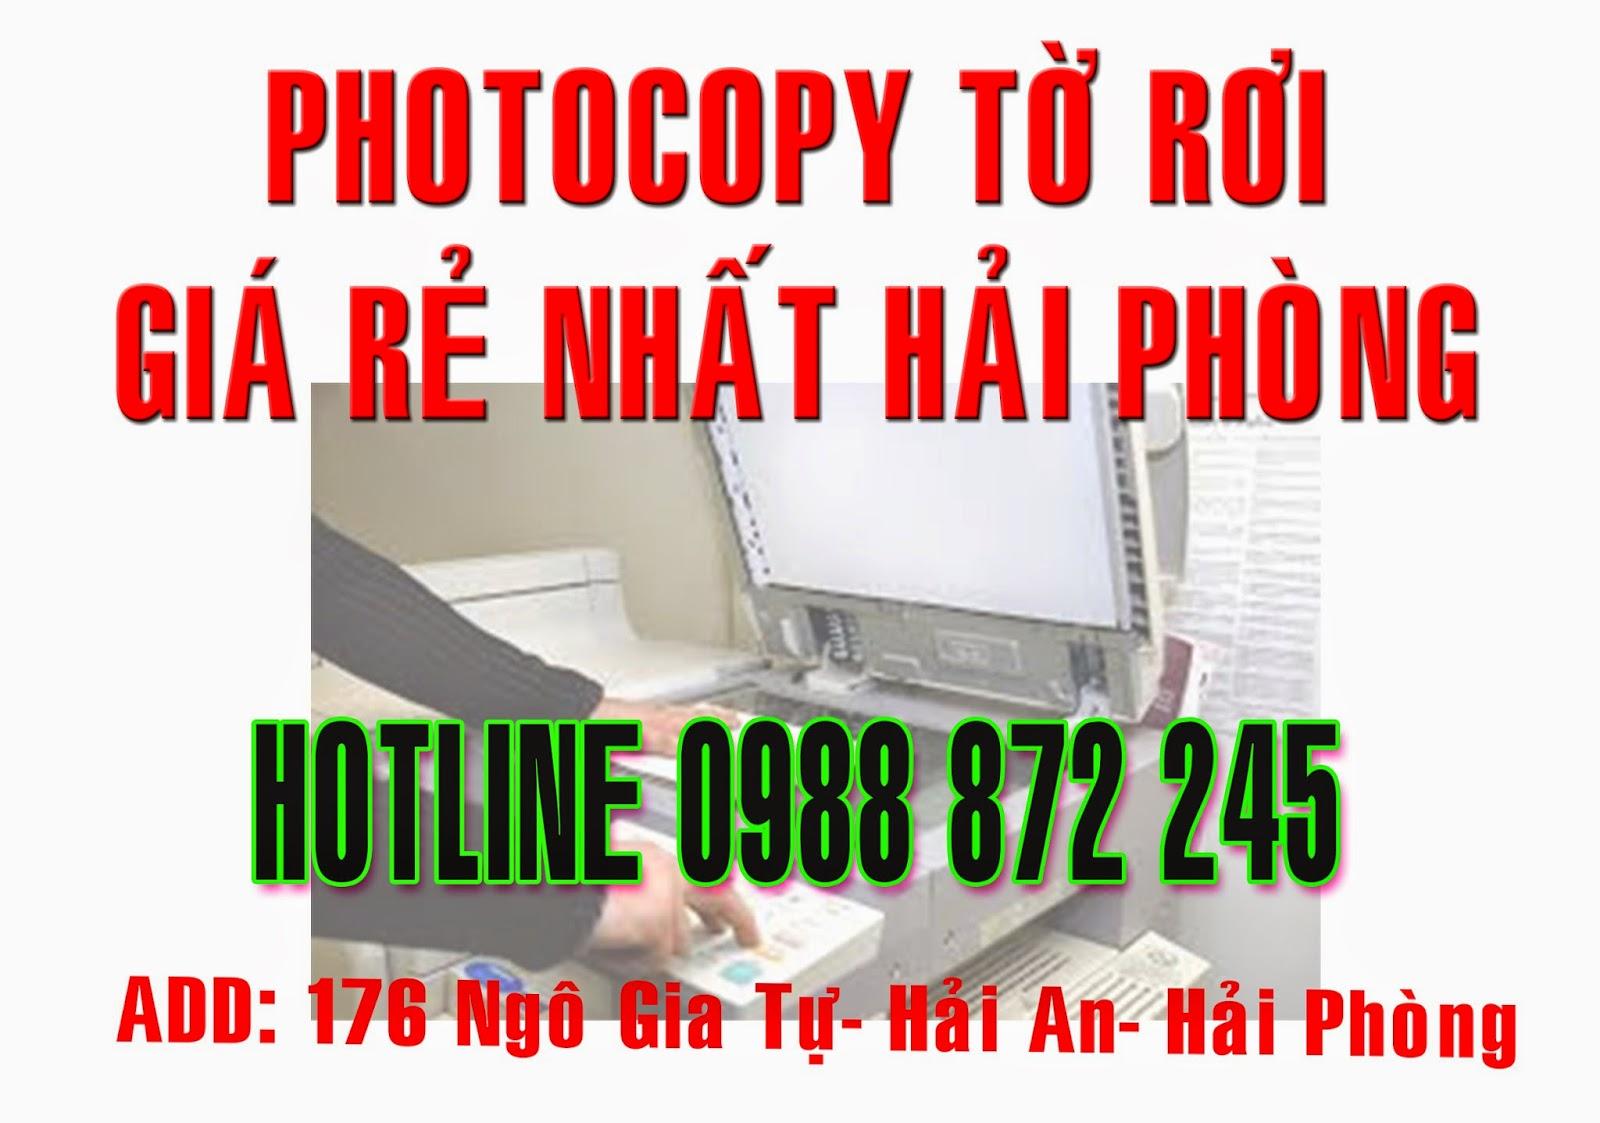 Photocopy gia Hai Phong